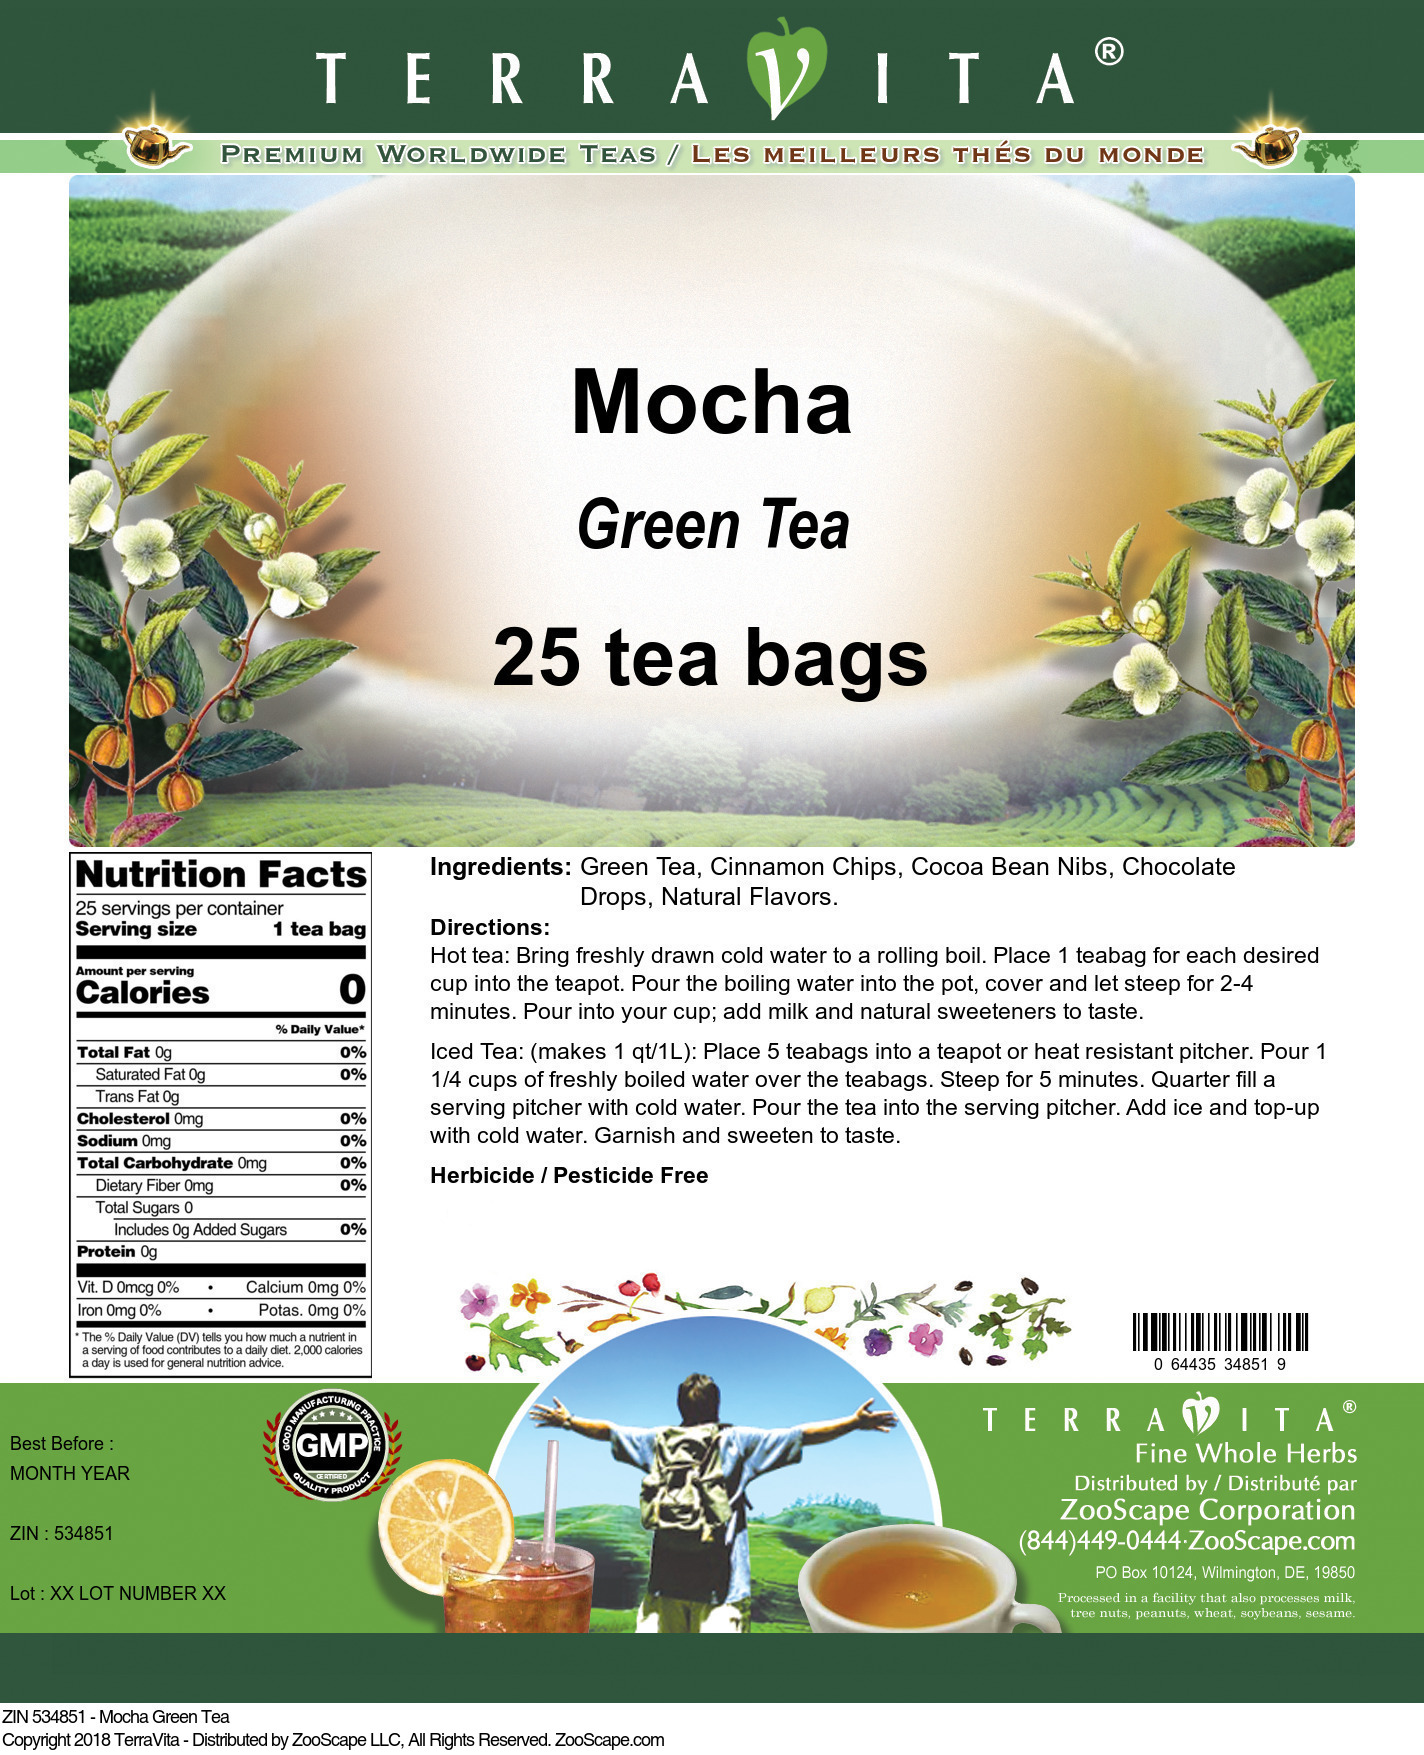 Mocha Green Tea